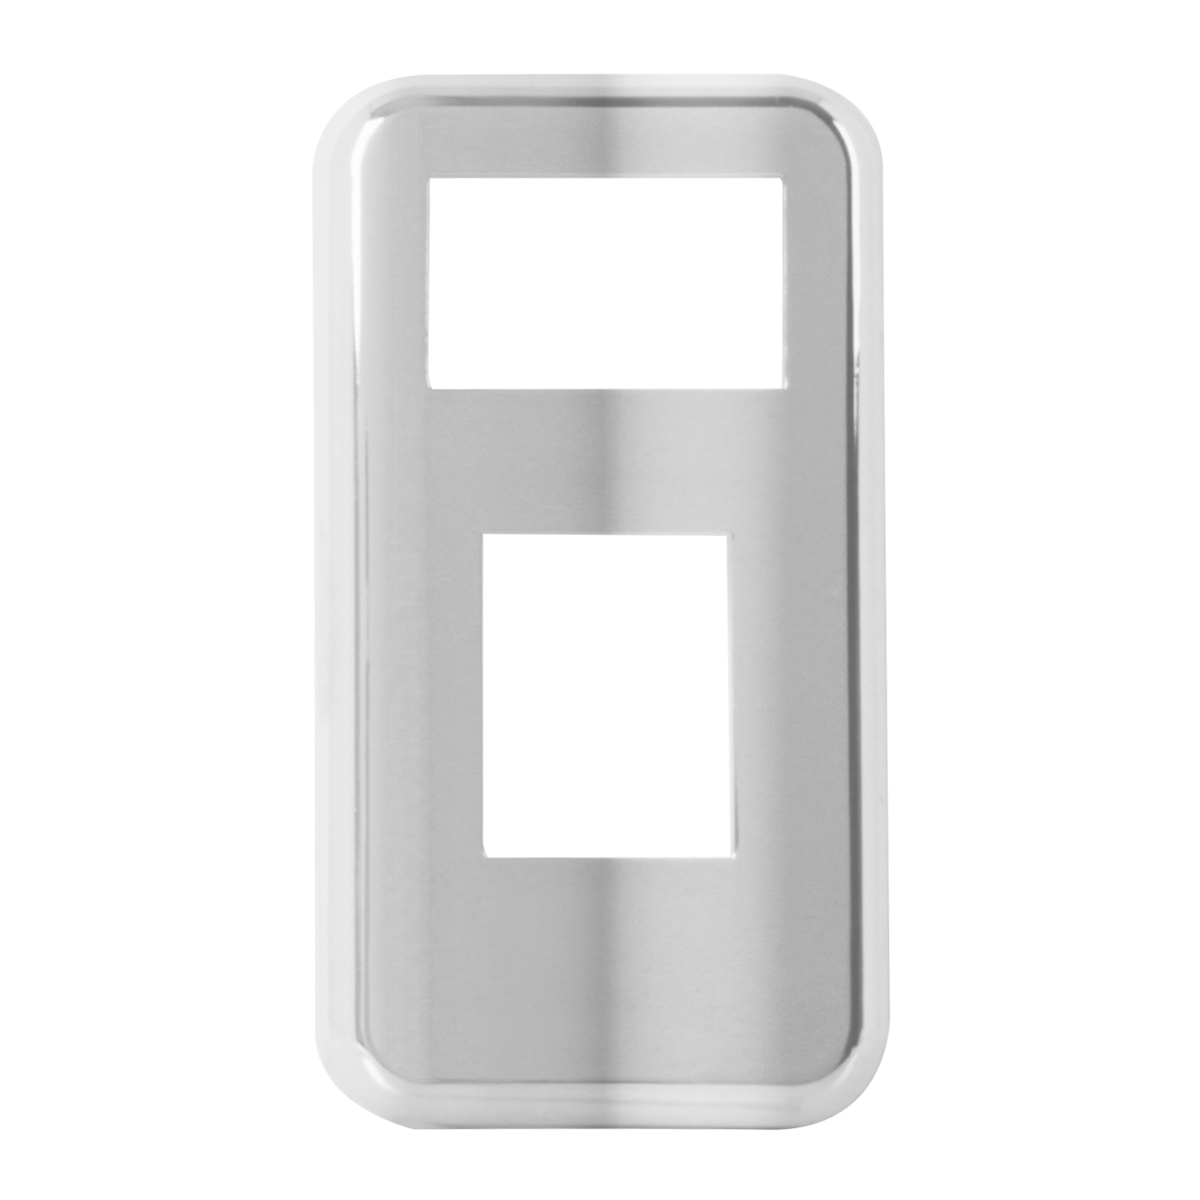 69006 Panel Switch Bezel for International I